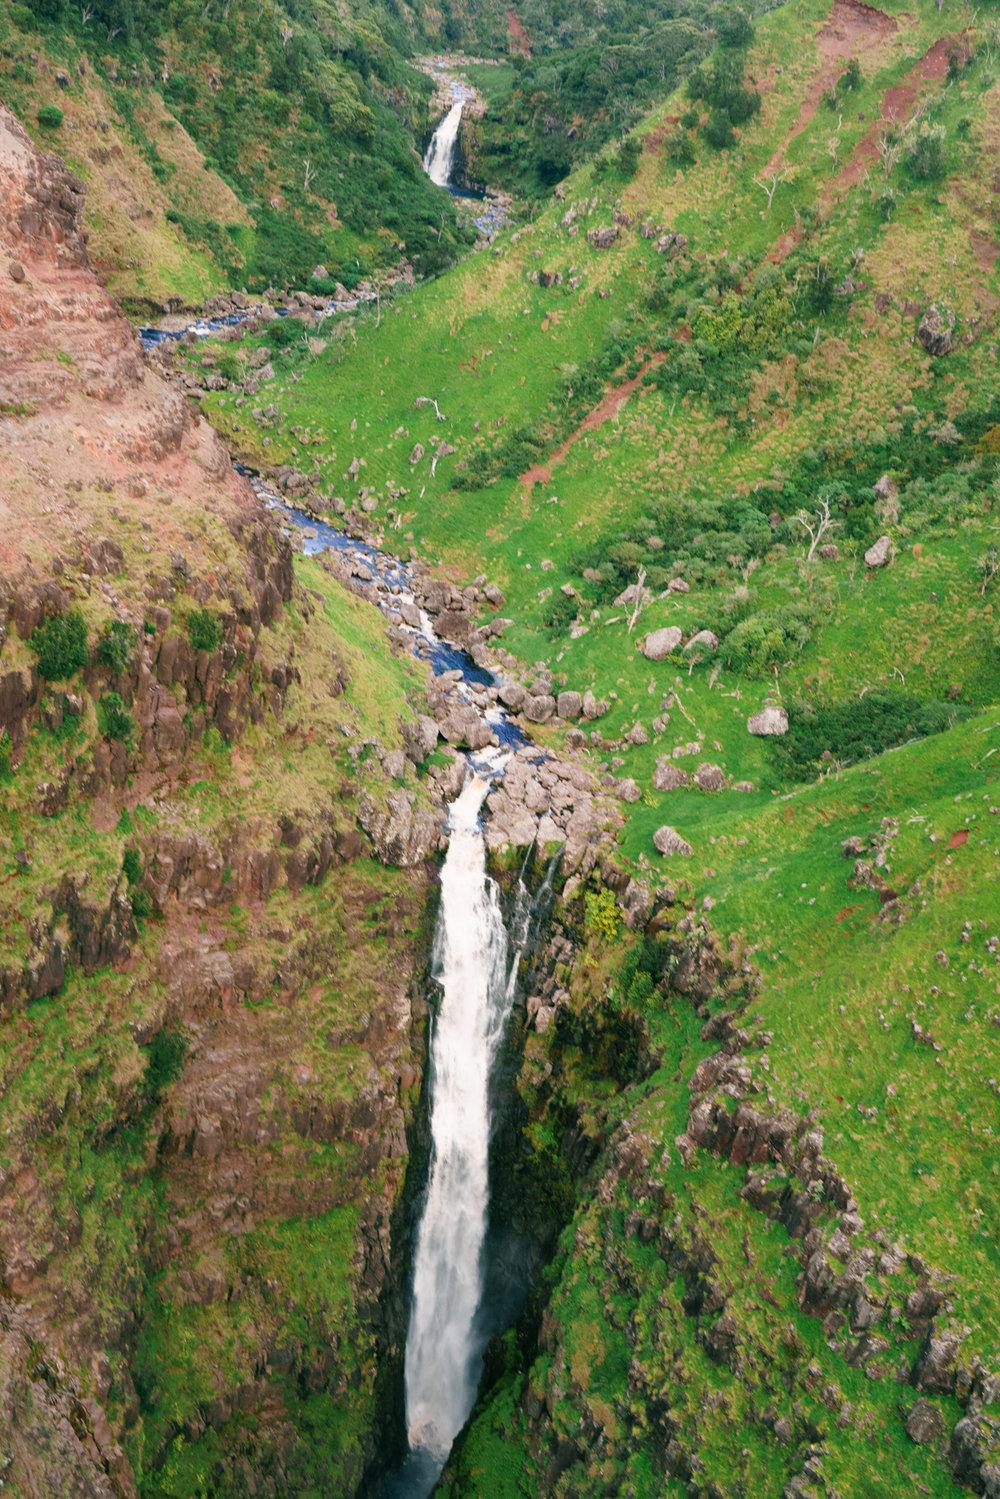 Kauai Waterfalls | Never Settle Travel